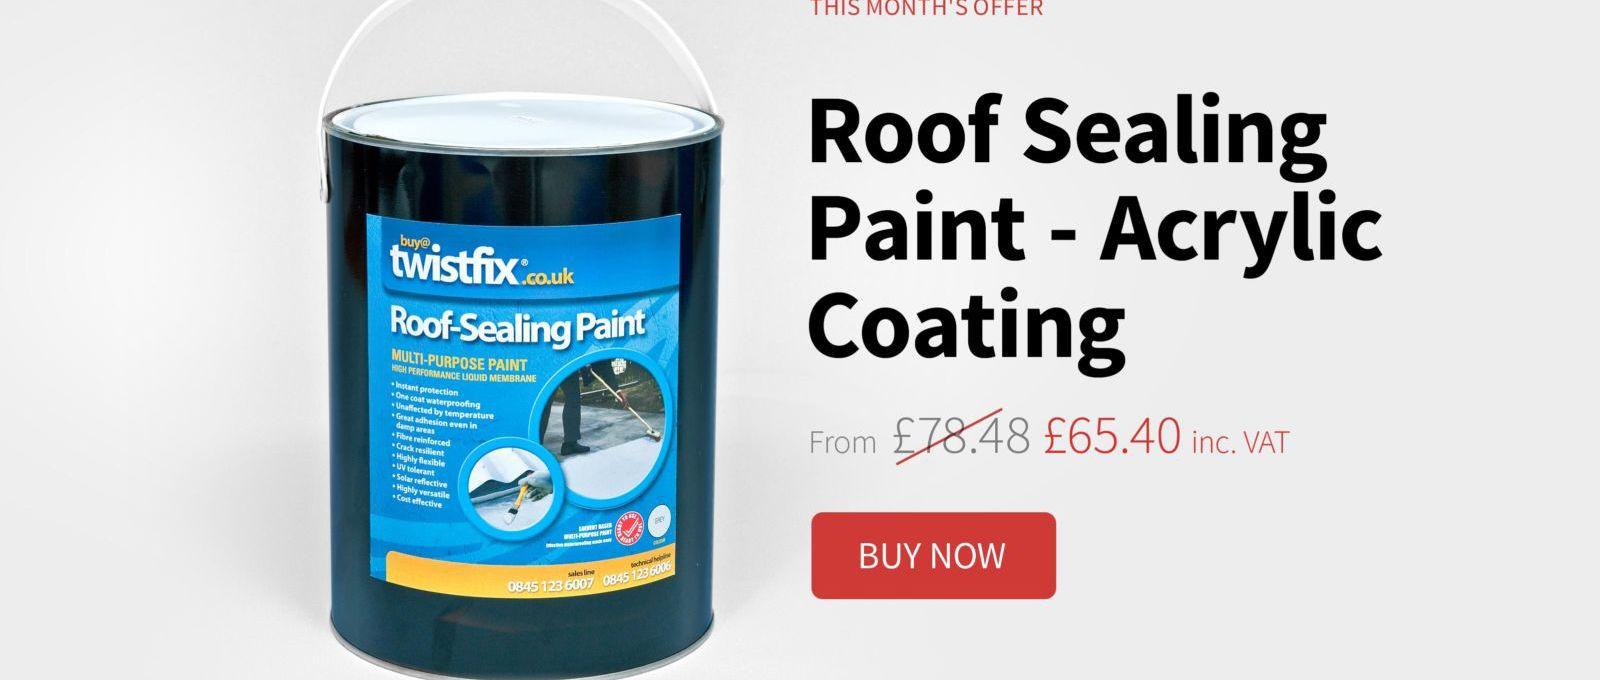 Wall Ties Damp Proofing And Basement Waterproofing